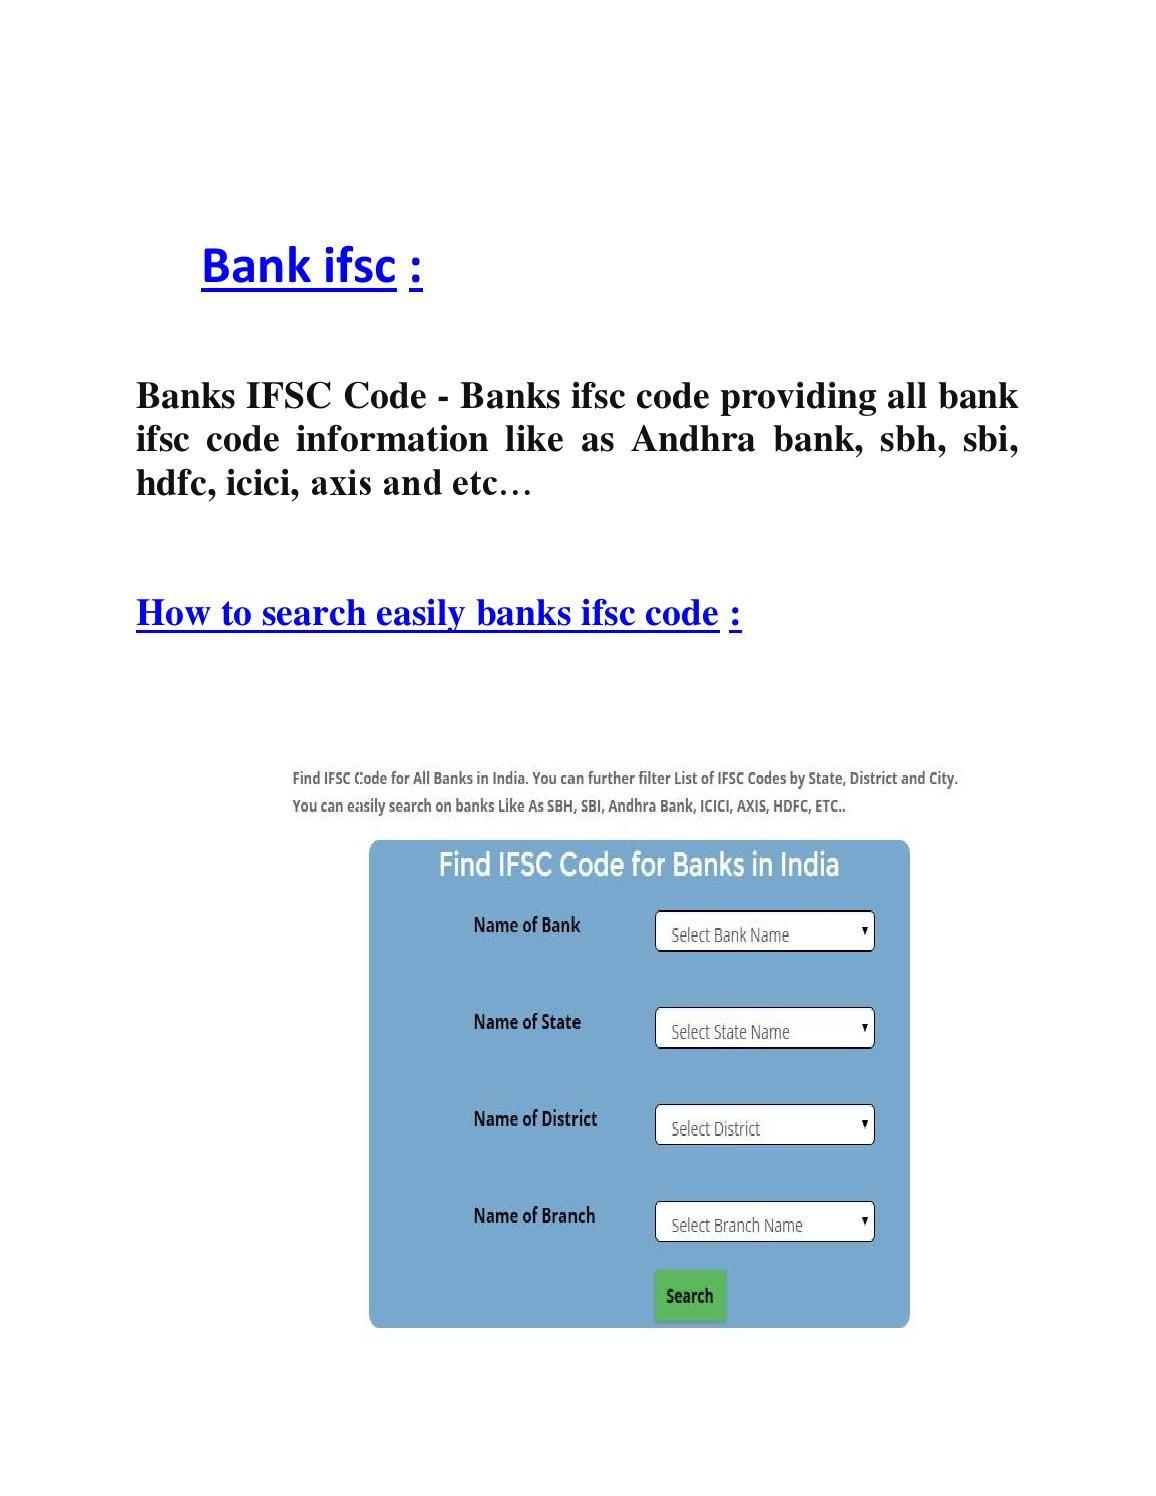 Bank Ifsc Coding Bank Branch Bar Chart